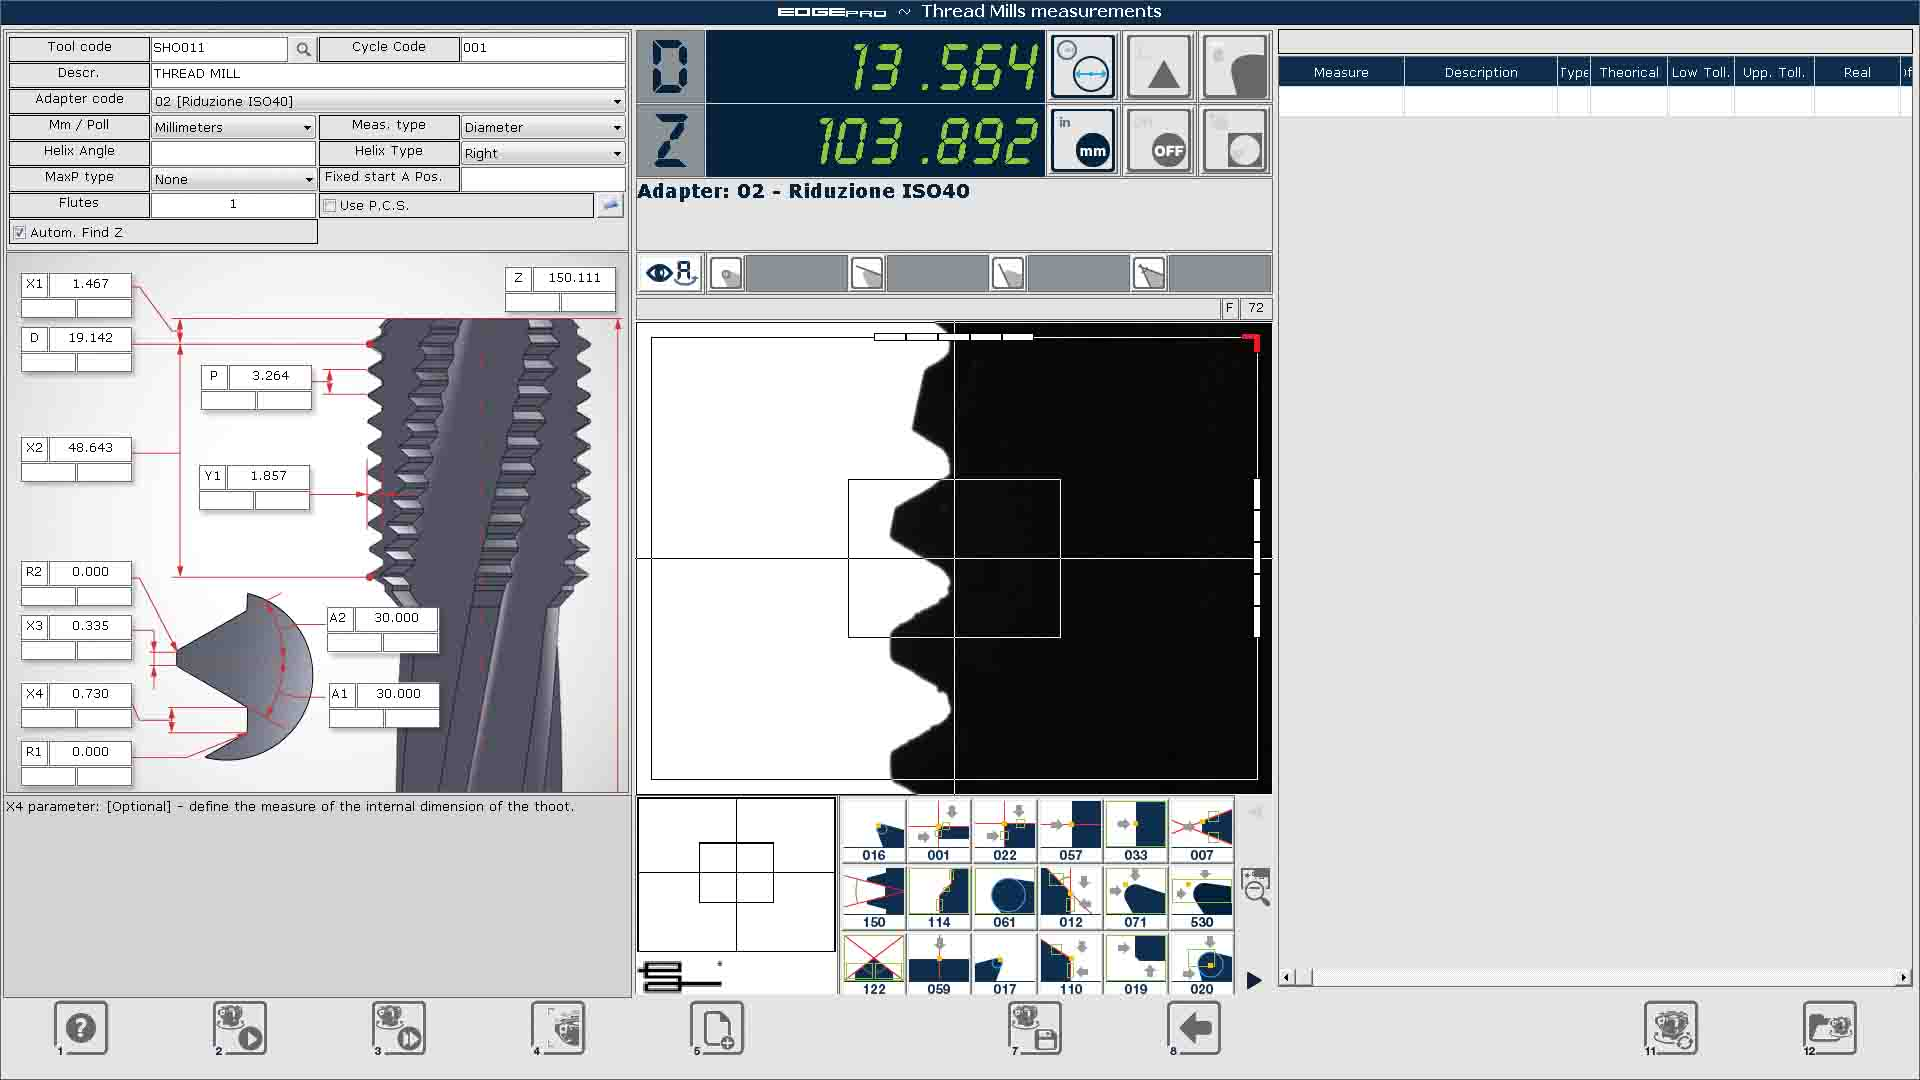 Edge Pro Thread Mills screen capture.